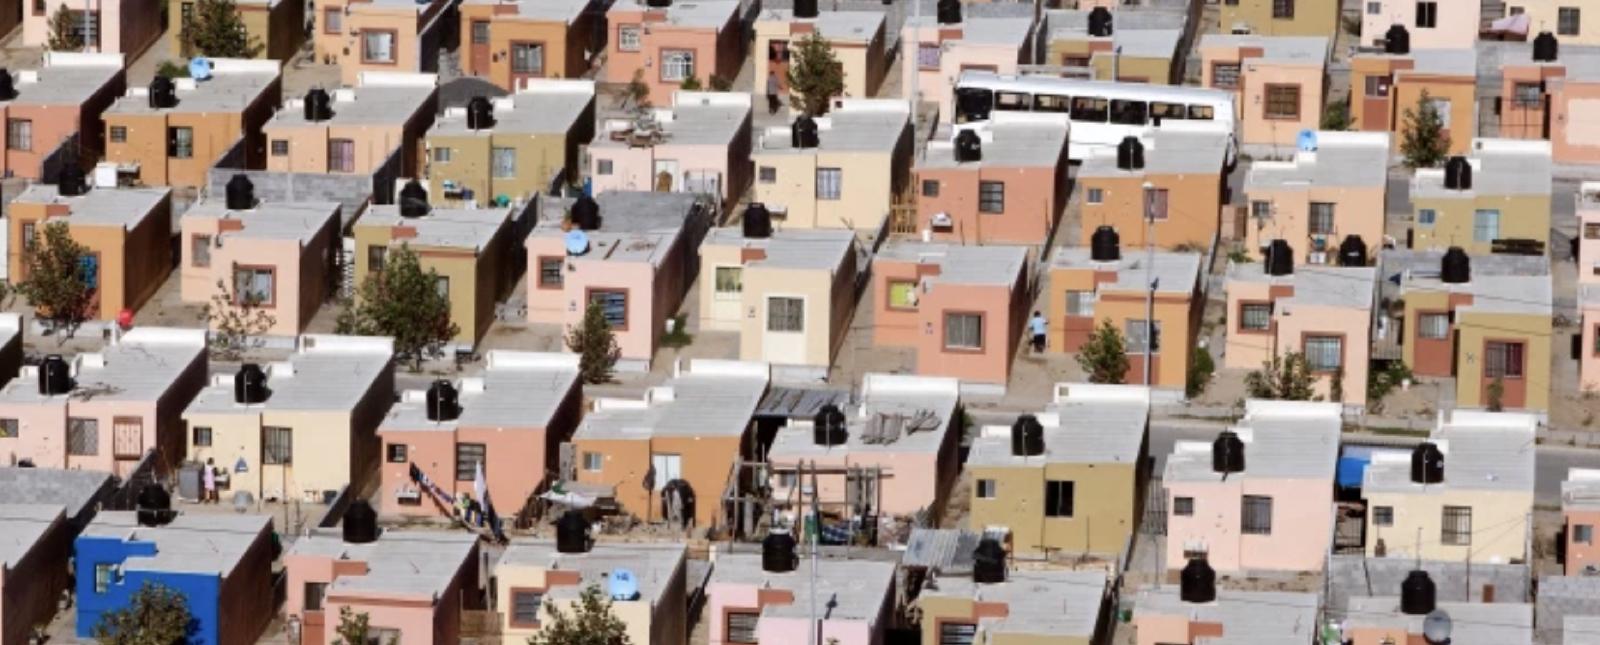 Los hogares falsos en México fotografiados por Jorge Taboada